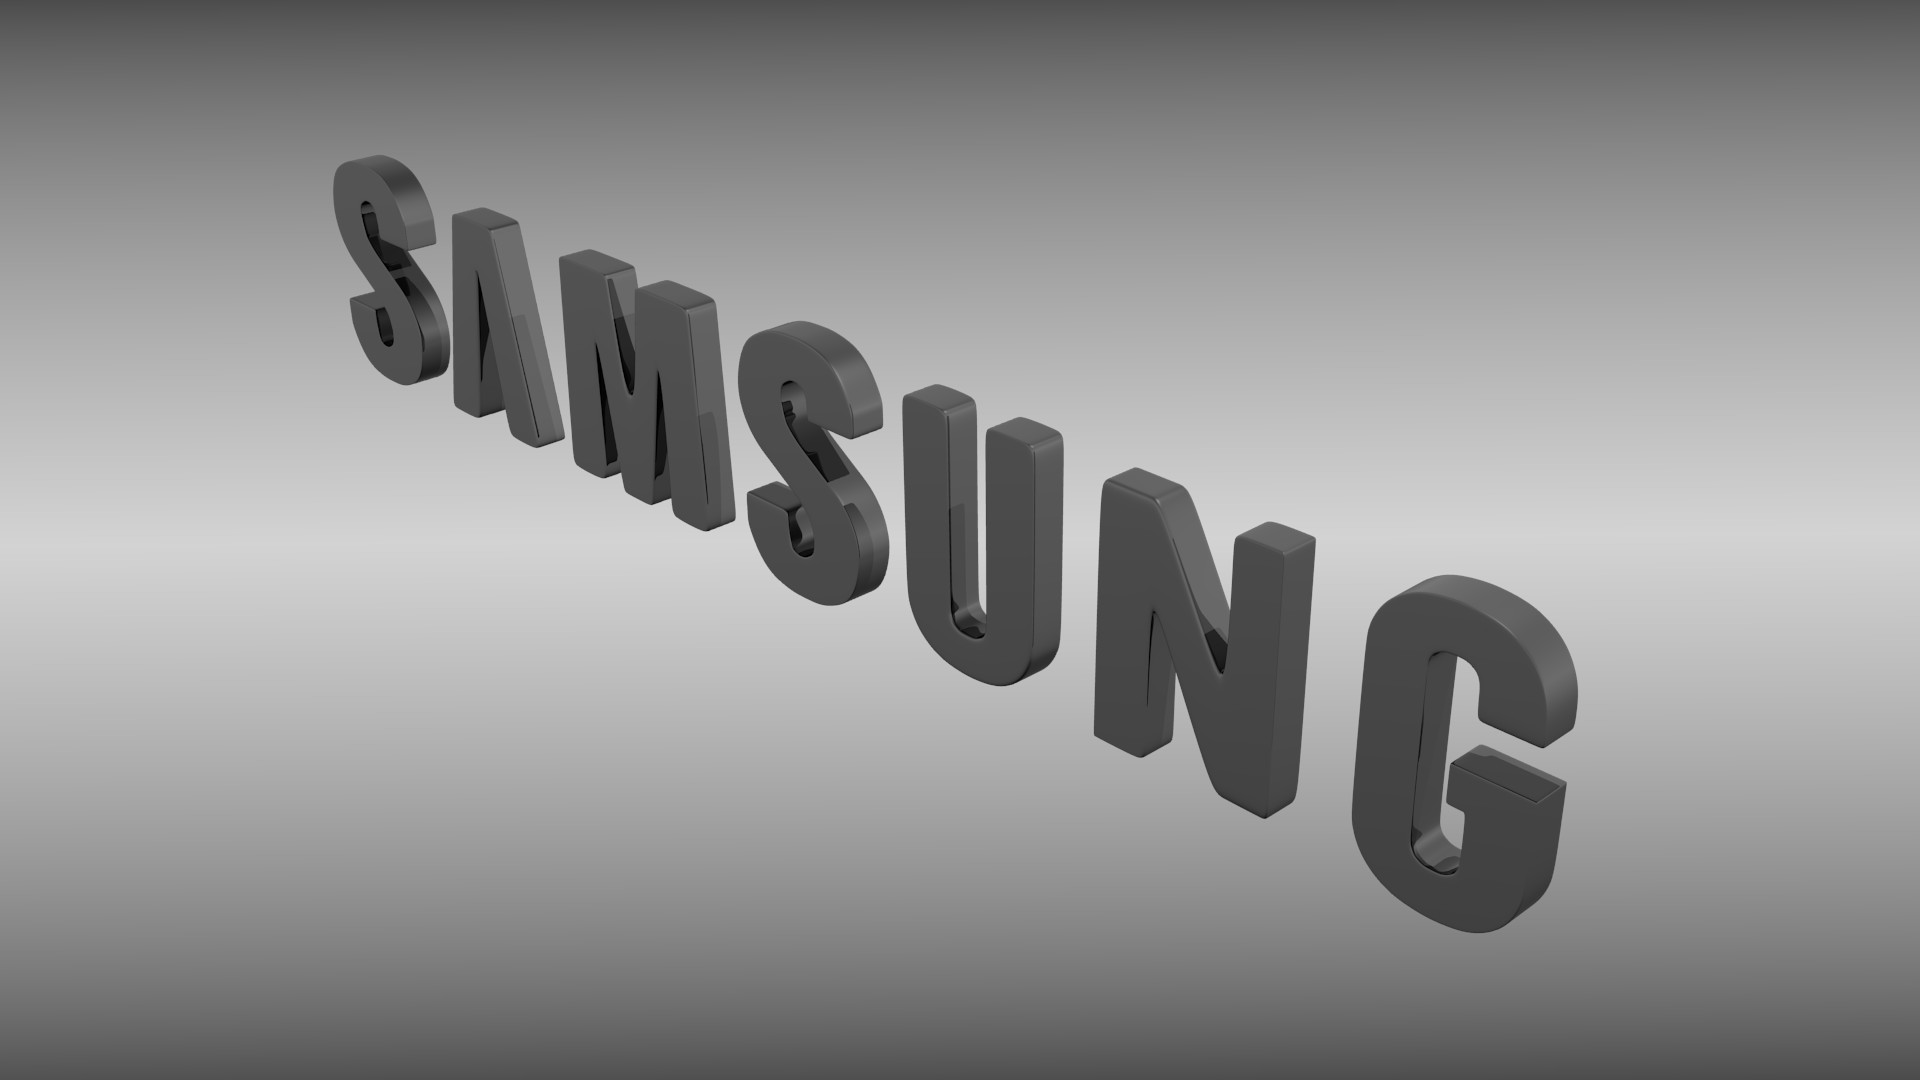 Galaxy S8 Wallpaper Hd Samsung Logo Wallpaper 80 Images